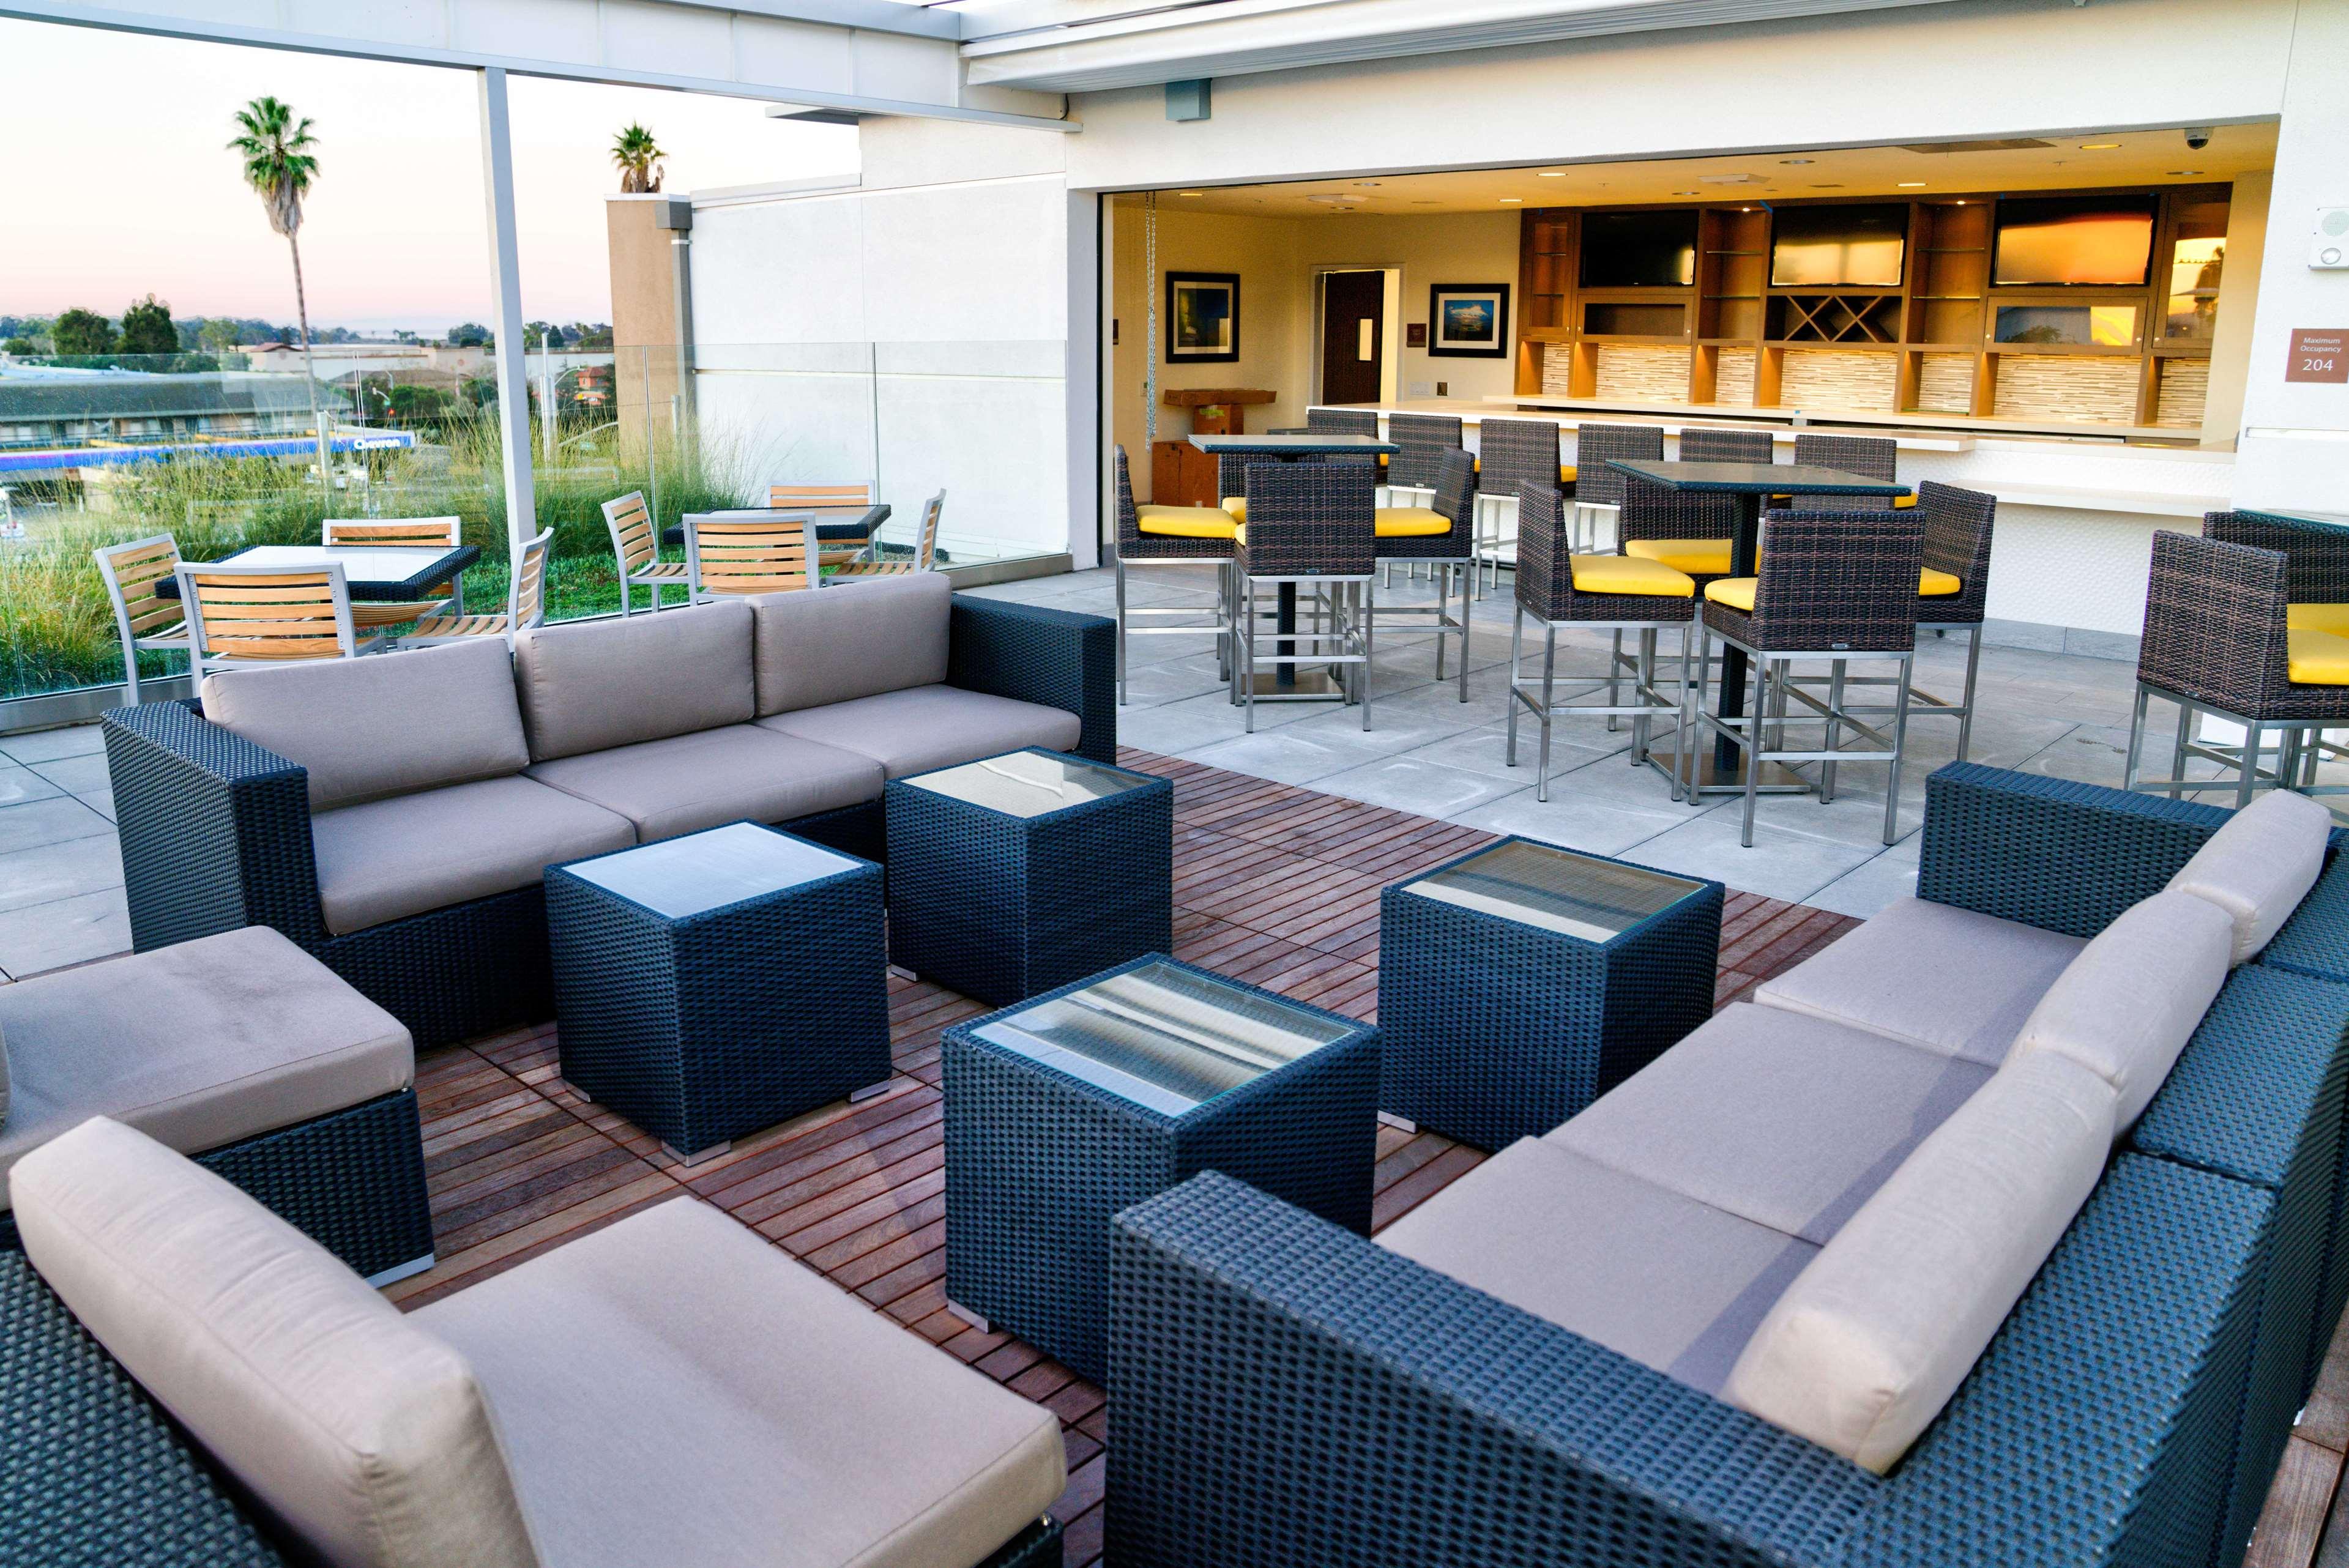 Hilton Garden Inn Santa Barbara/Goleta image 8